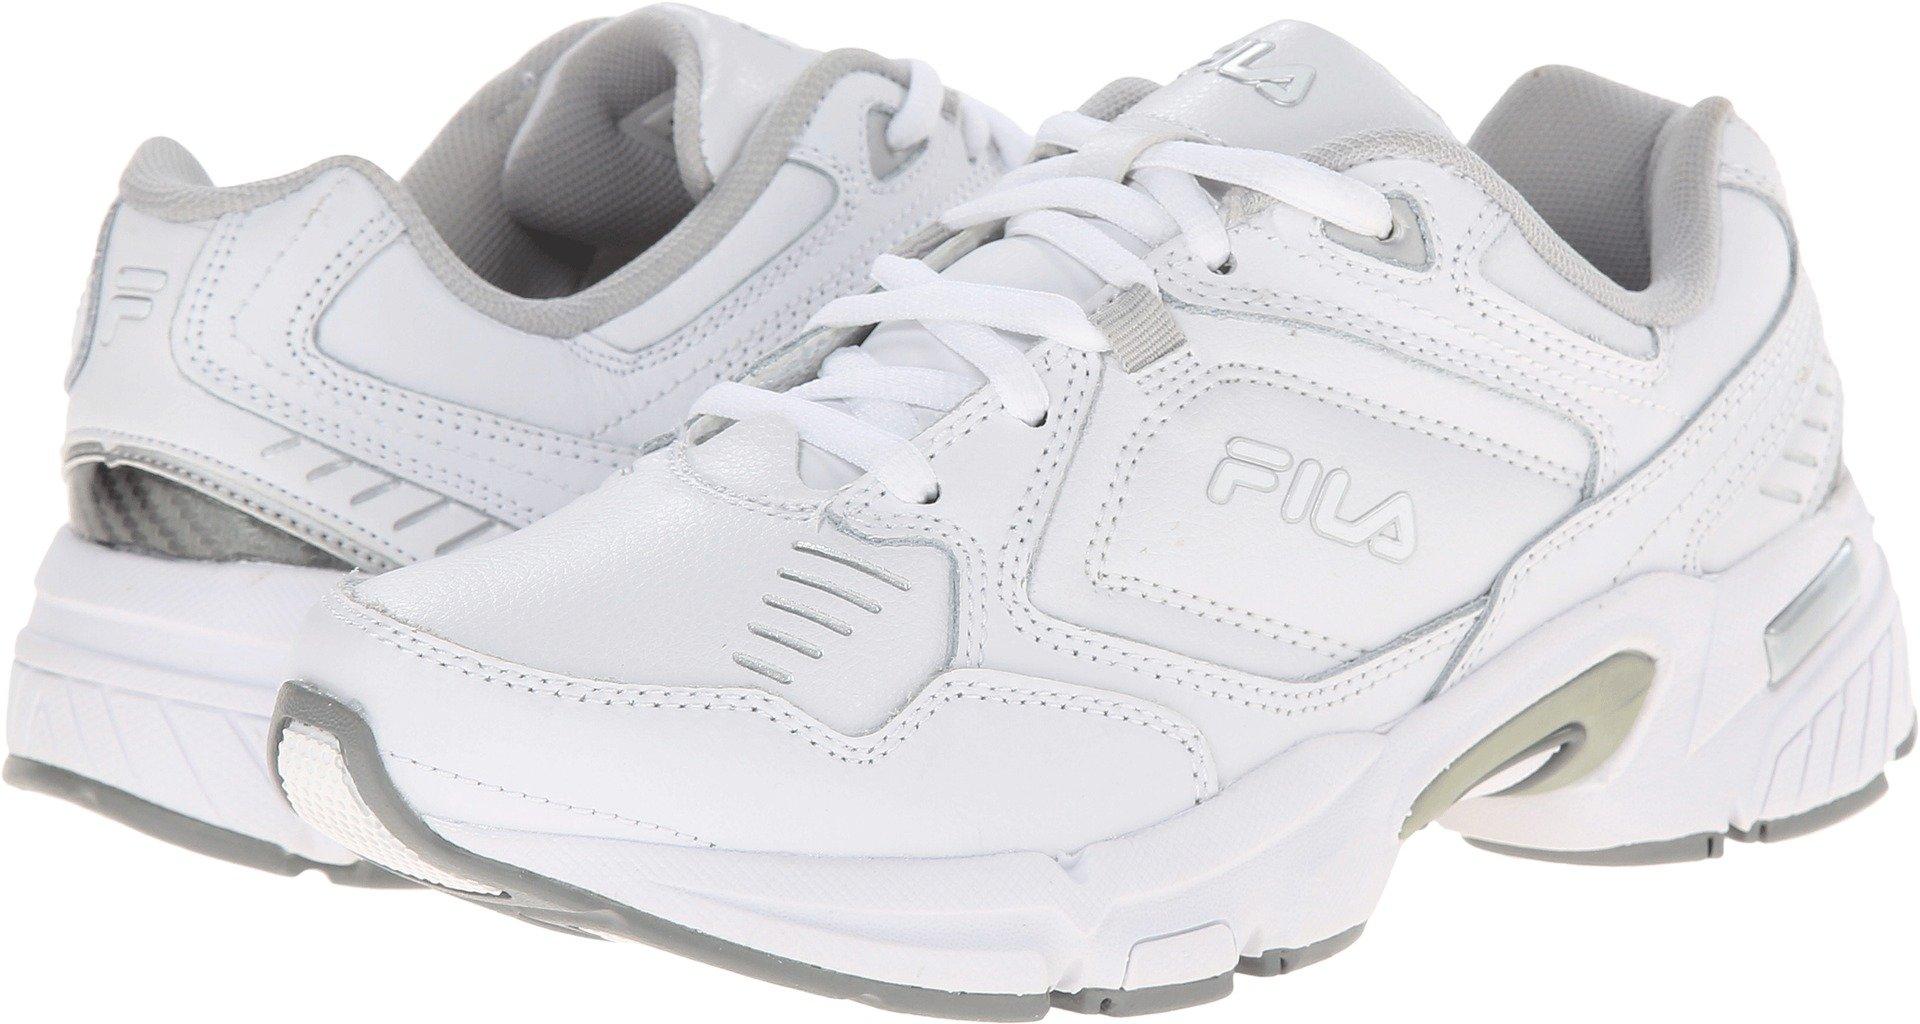 Fila Women's Memory Comfort Trainer Training Shoe,White/White/Silver,9 W US